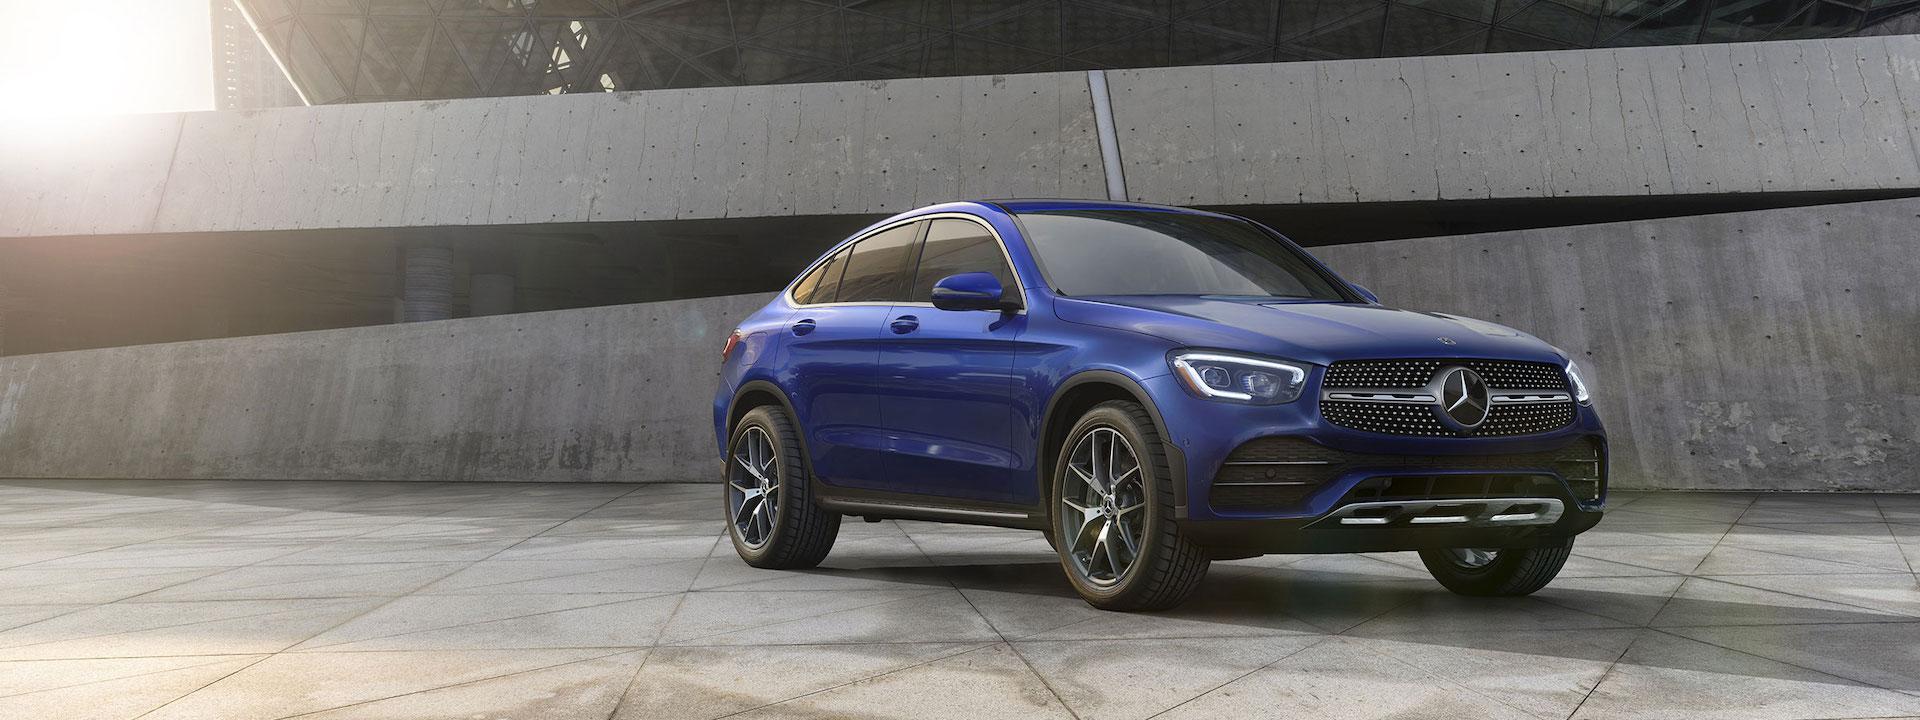 2020 Mercedes-Benz GLC Coupe | ZT Motors of Fort Walton Beach